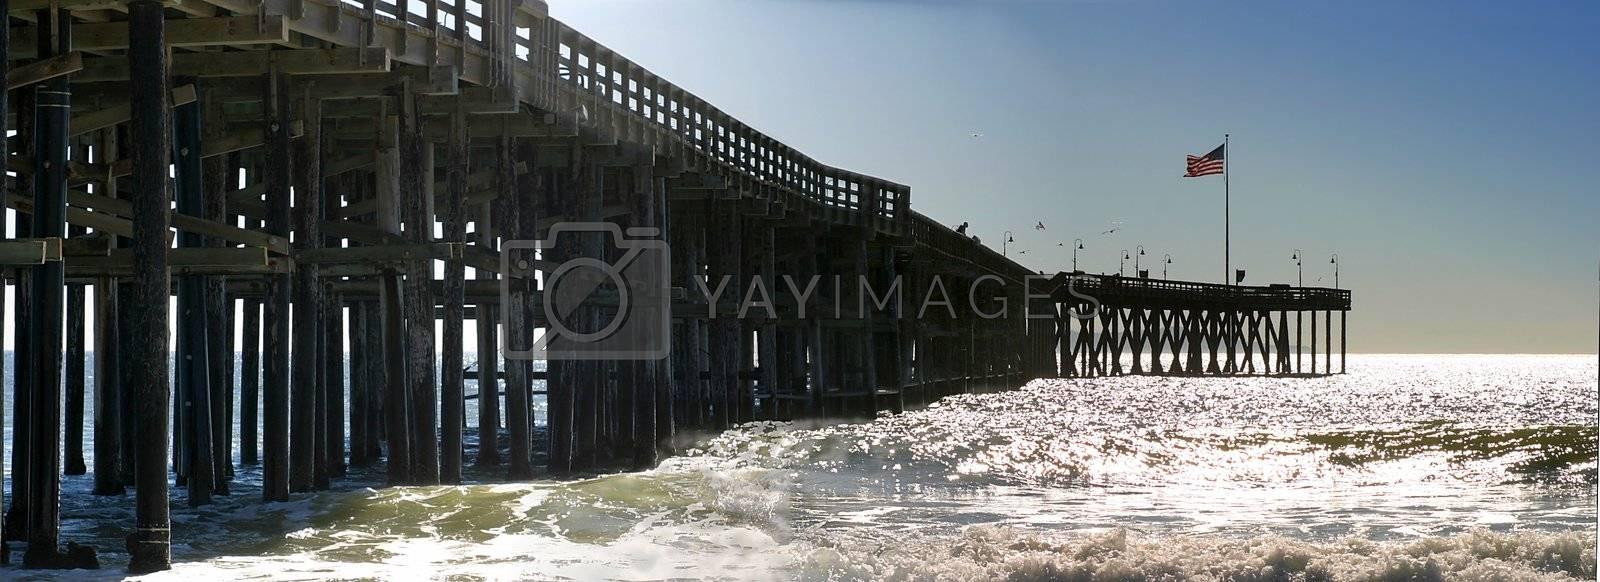 Ventura Pier (12) by hlehnerer